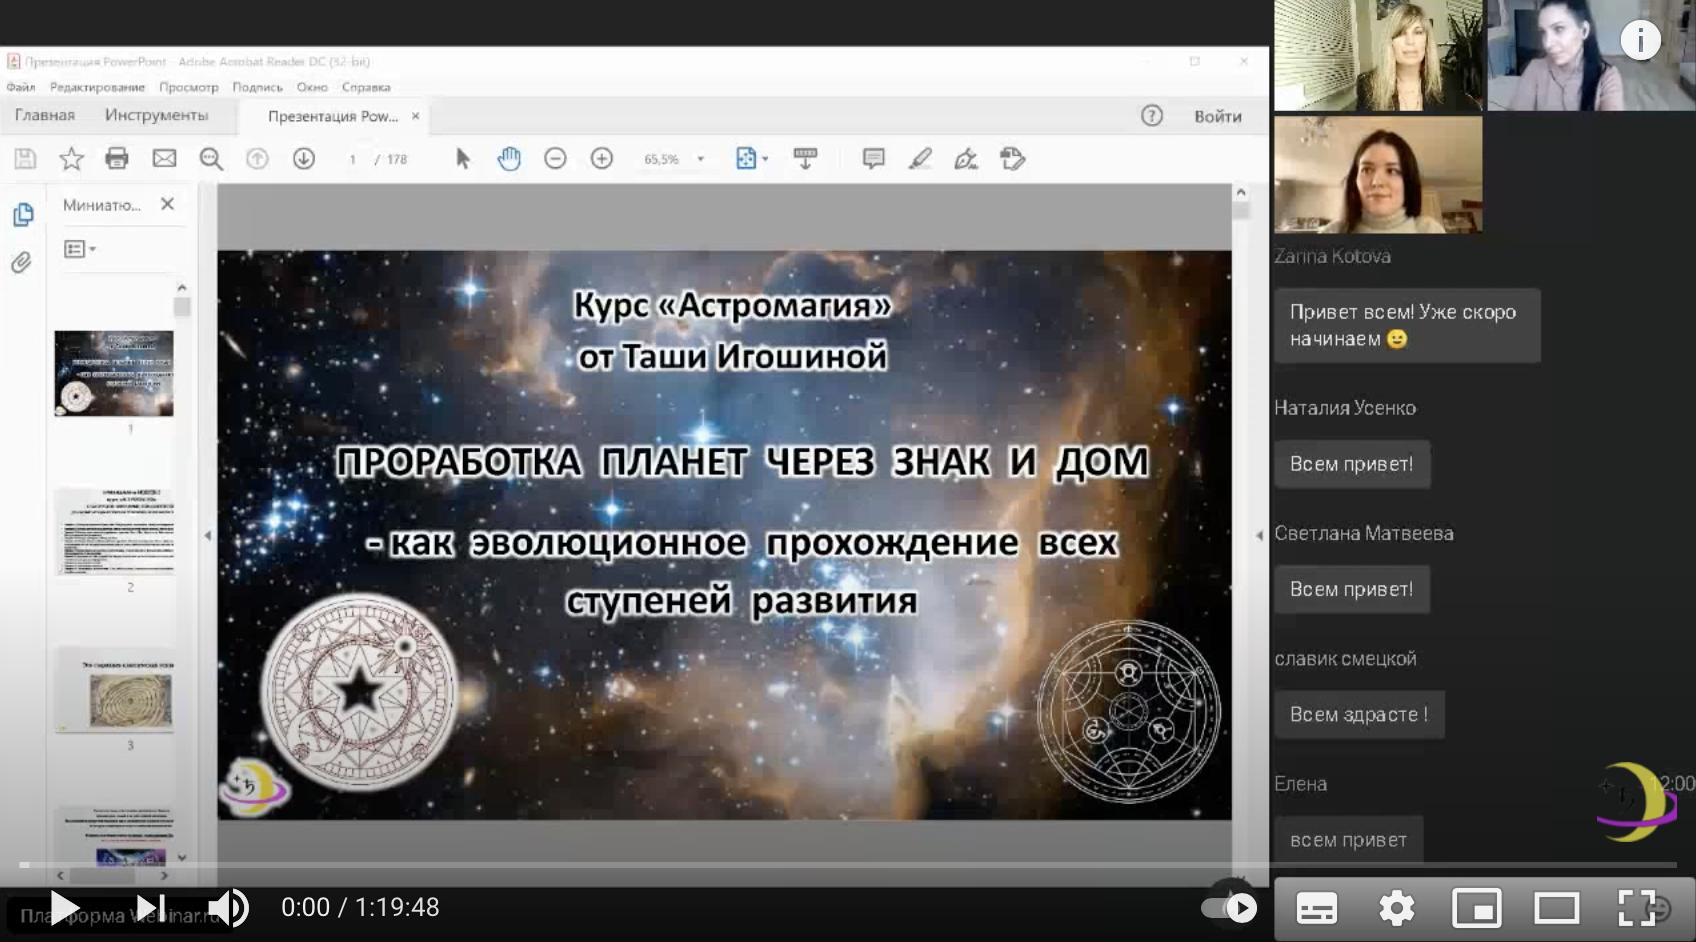 https://astrologtasha.ru/wp-content/uploads/2021/04/Screen-Shot-2021-04-13-at-11.45.00-PM.png